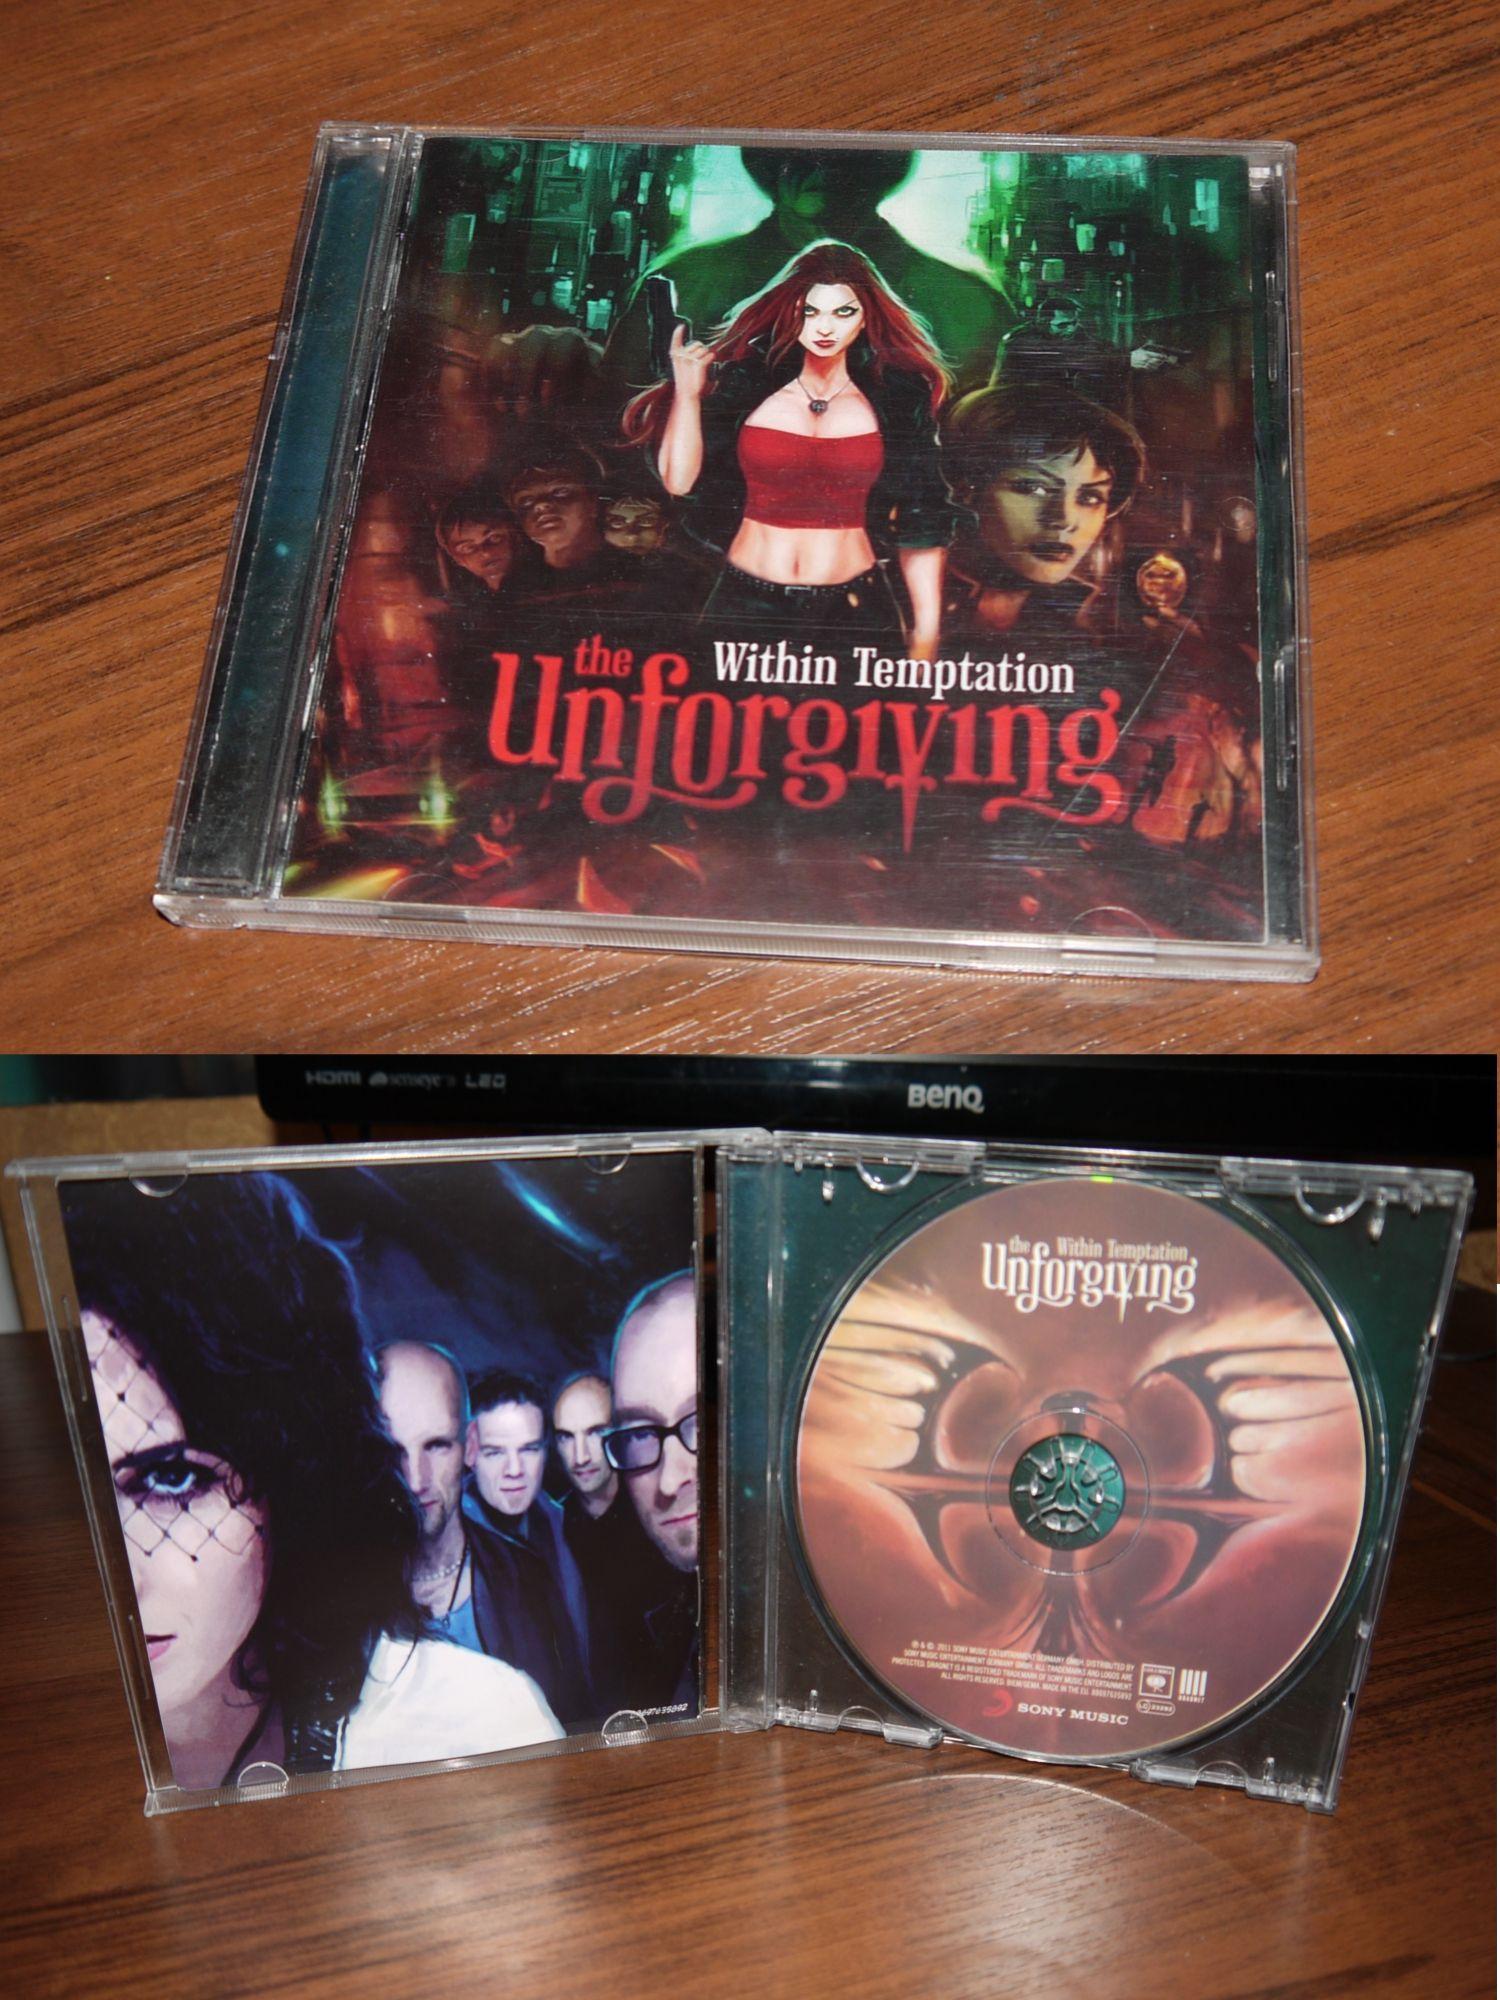 Within Temptation - The Unforgiving (jewel case) (Roadrunner 2011) Ukrainian edition